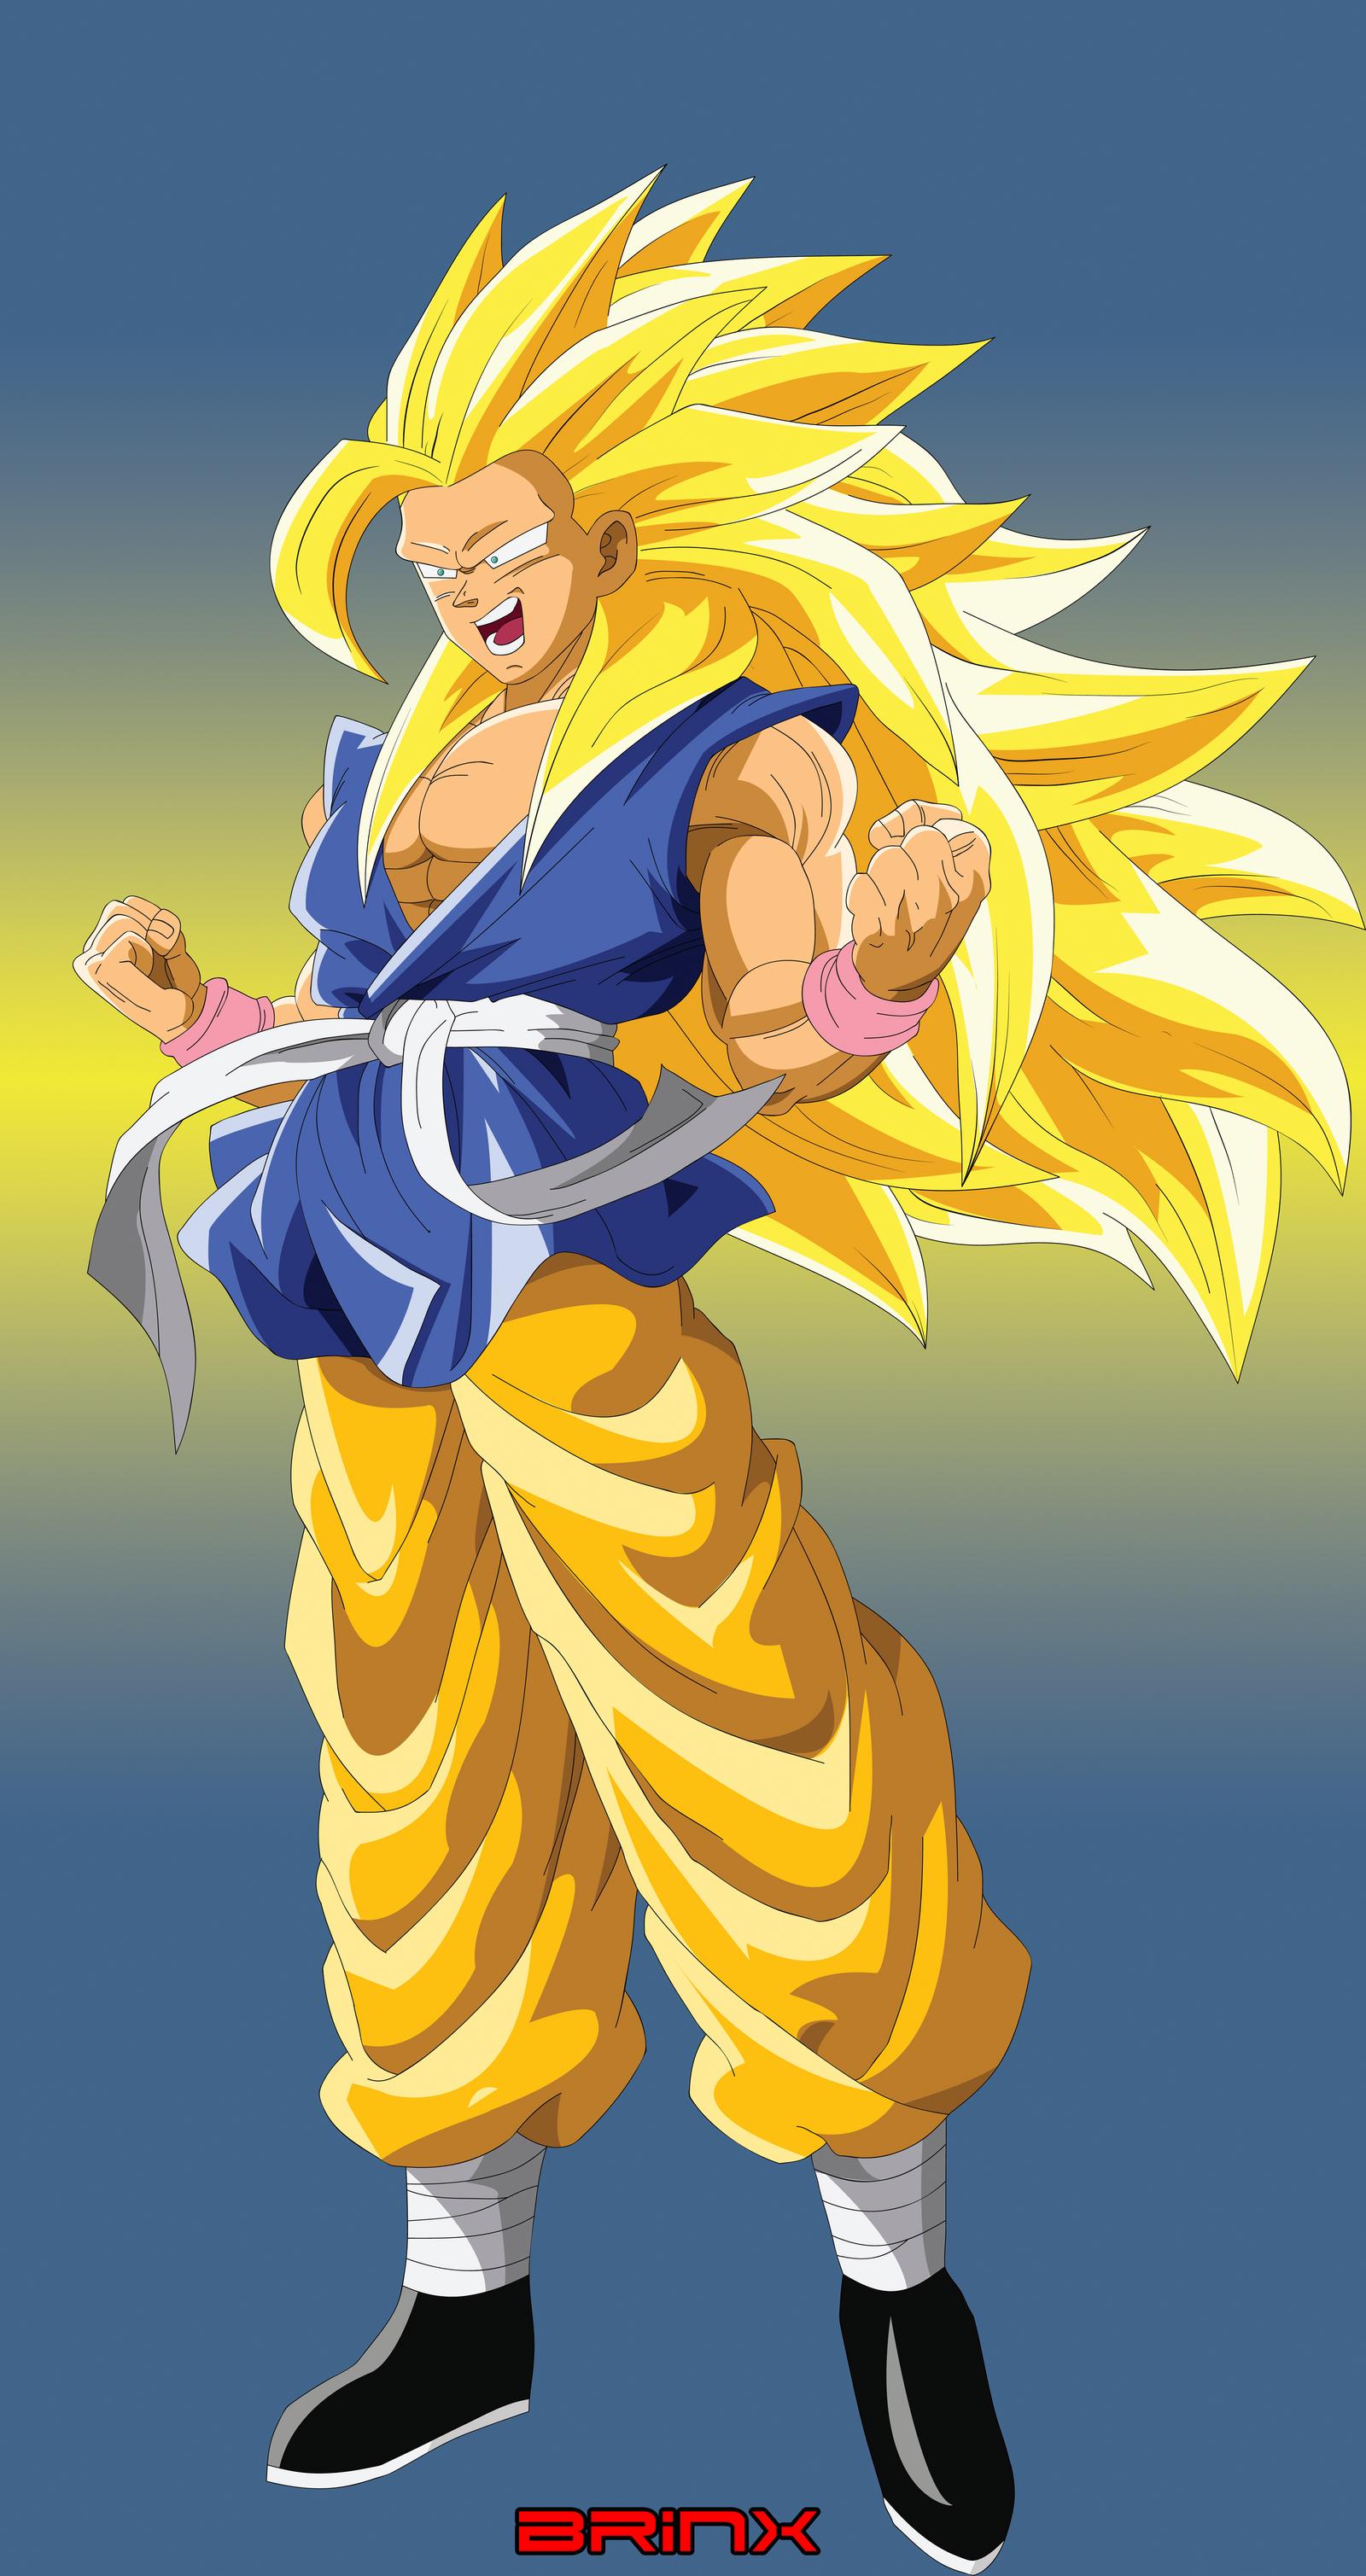 Goku True SSJ 4 form by Brinx-dragonball